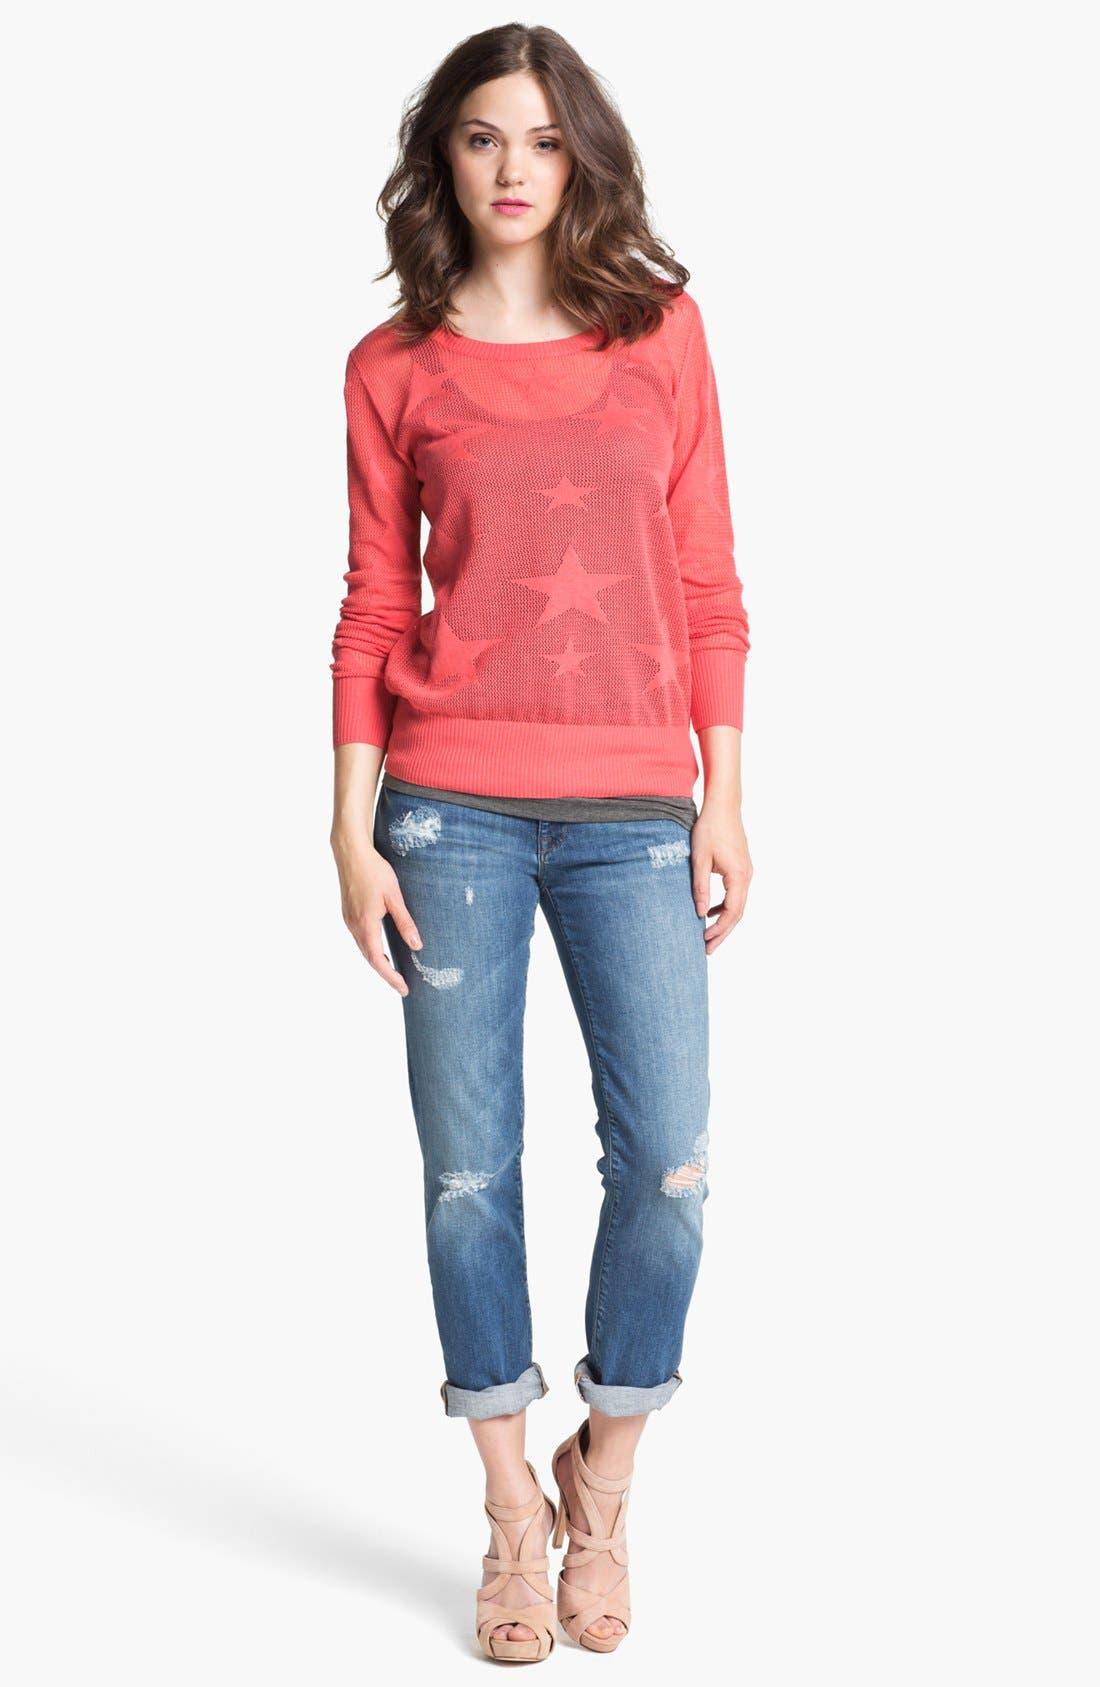 Alternate Image 1 Selected - Mavi Jeans 'Emma' Slim Boyfriend Jeans (Nolita Blue) (Online Only)